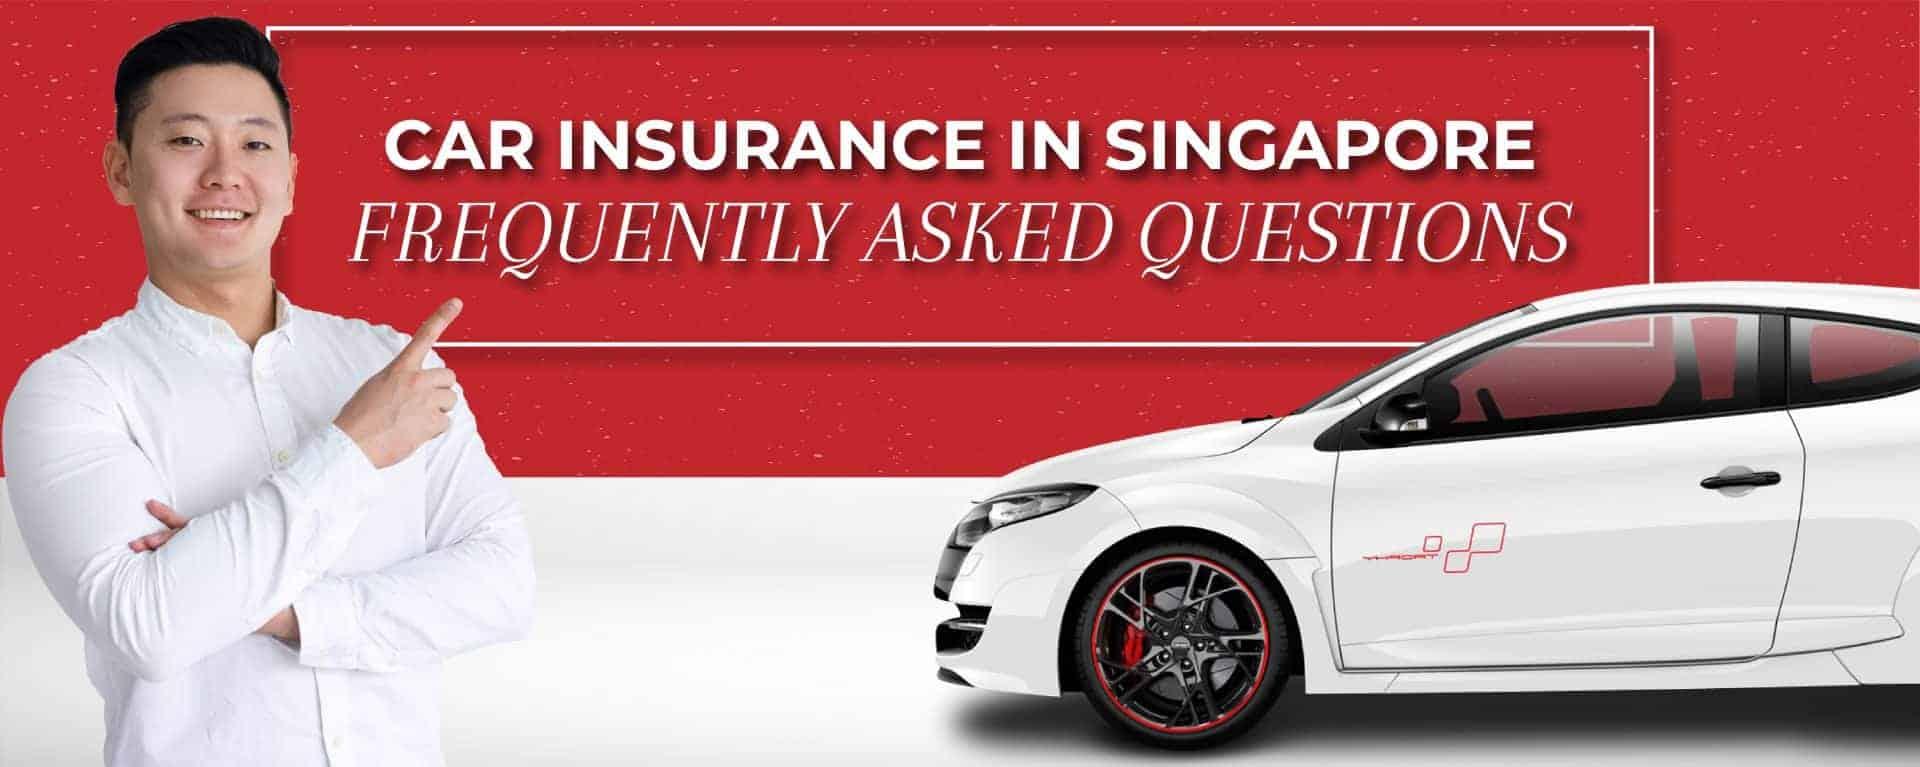 Car insurance in Singapore FAQ